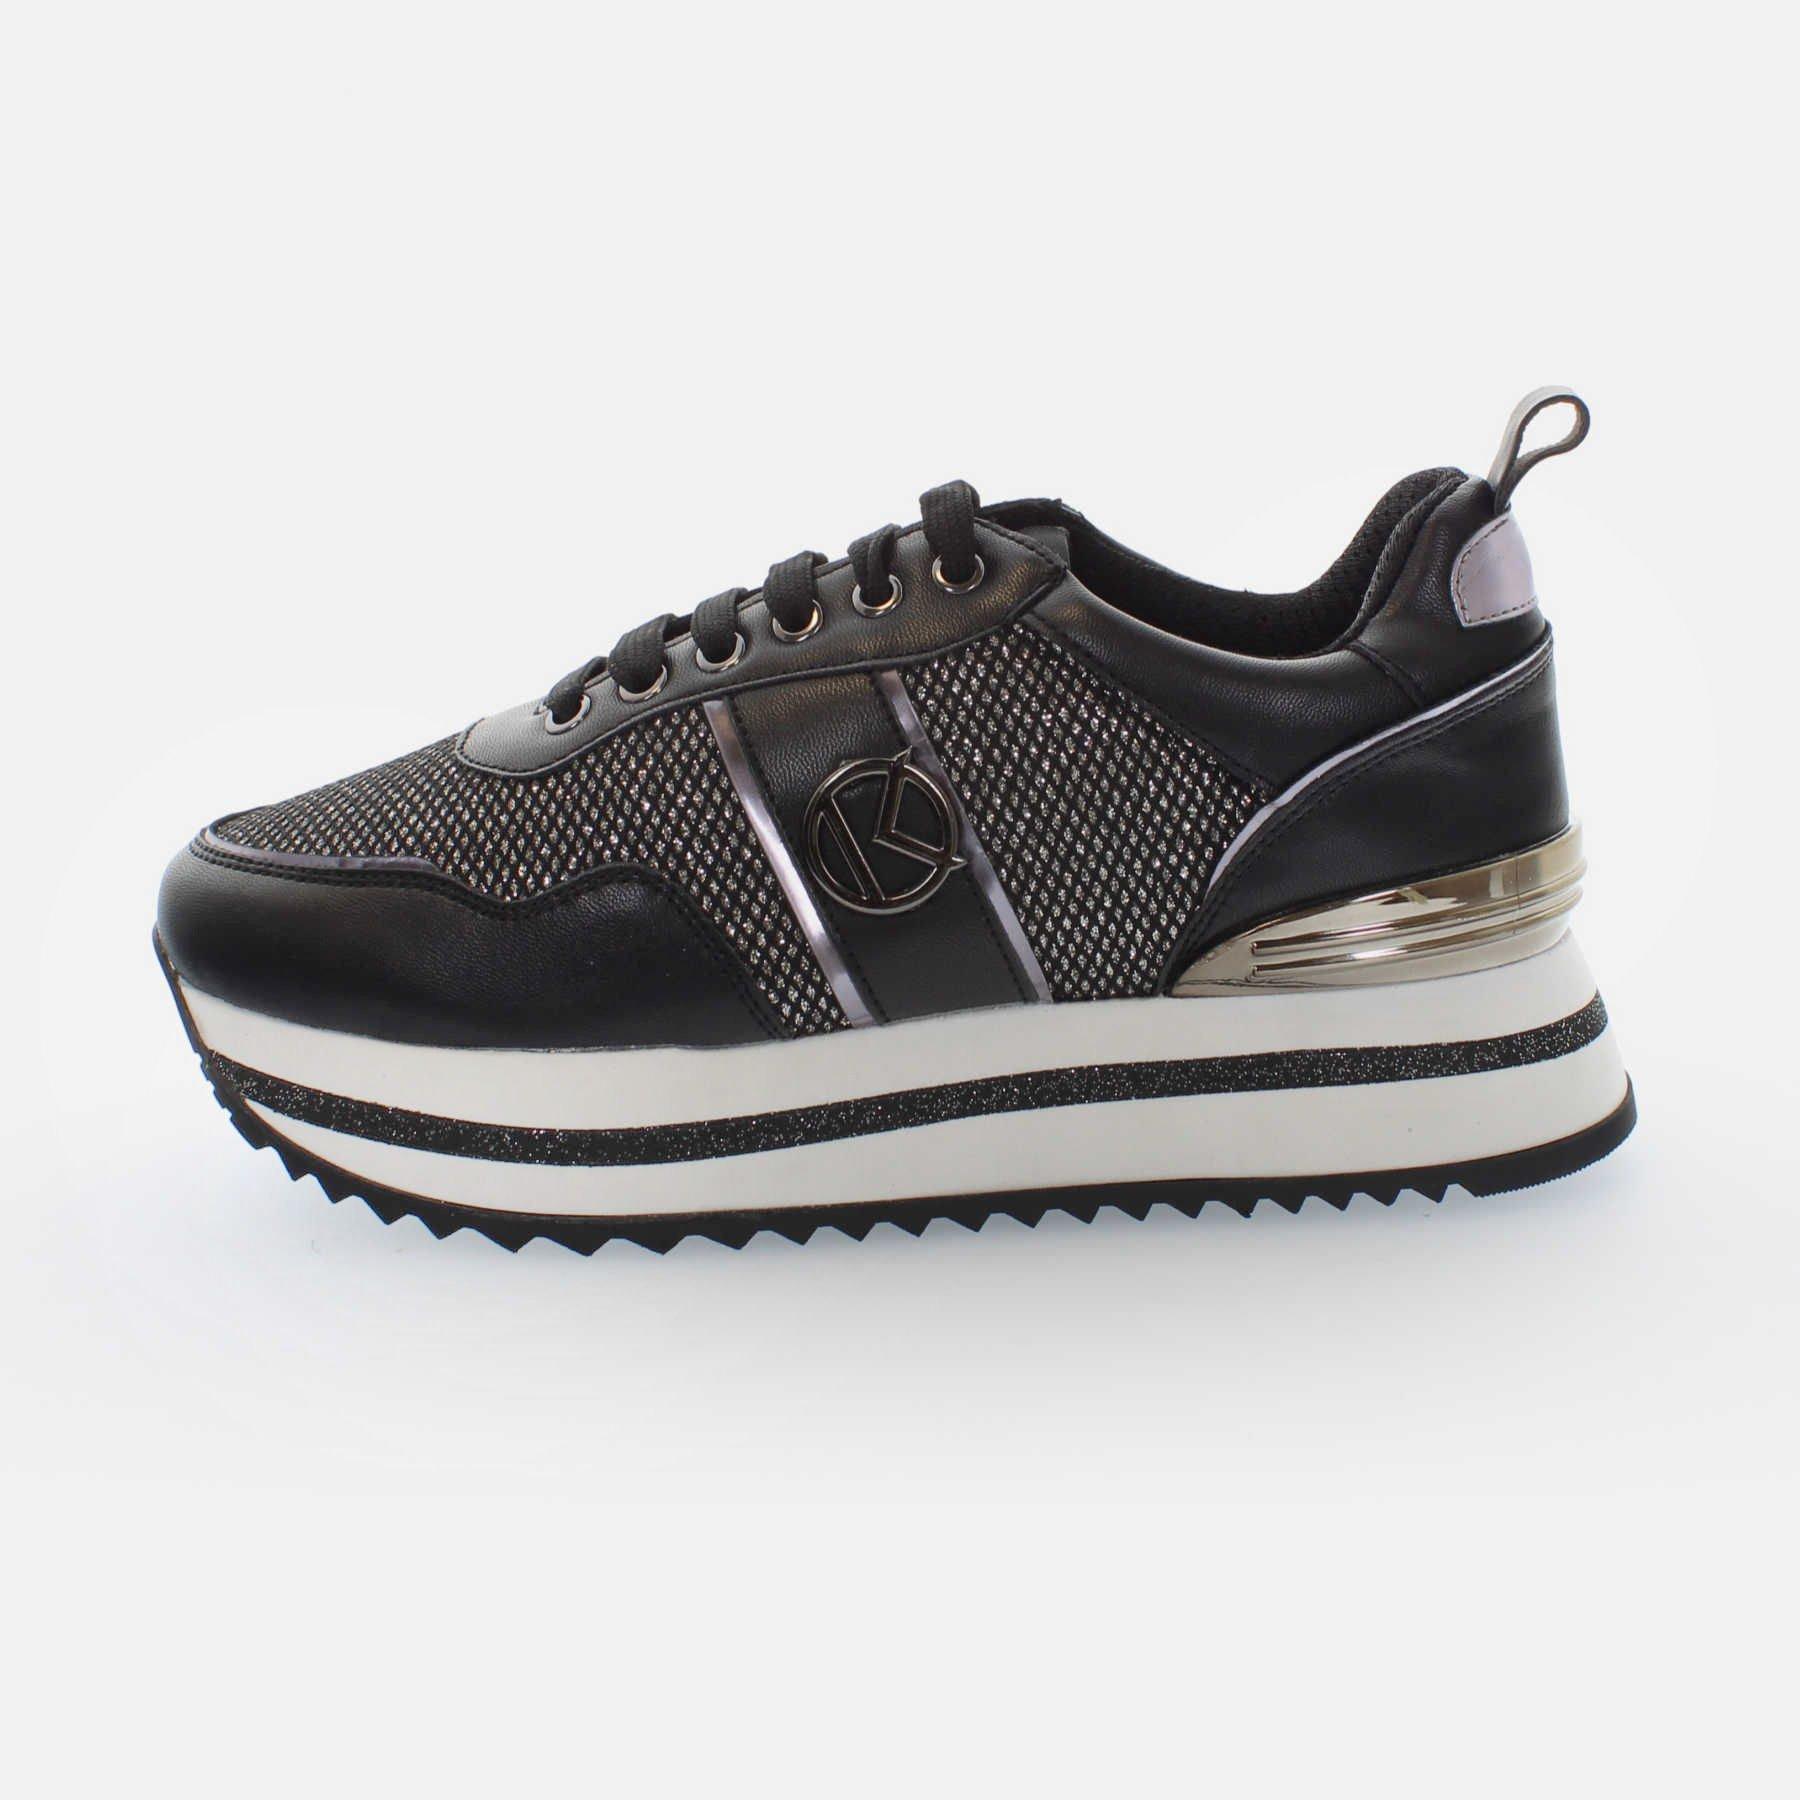 Kharisma Sneakers mesh dettagli argento nero 2017